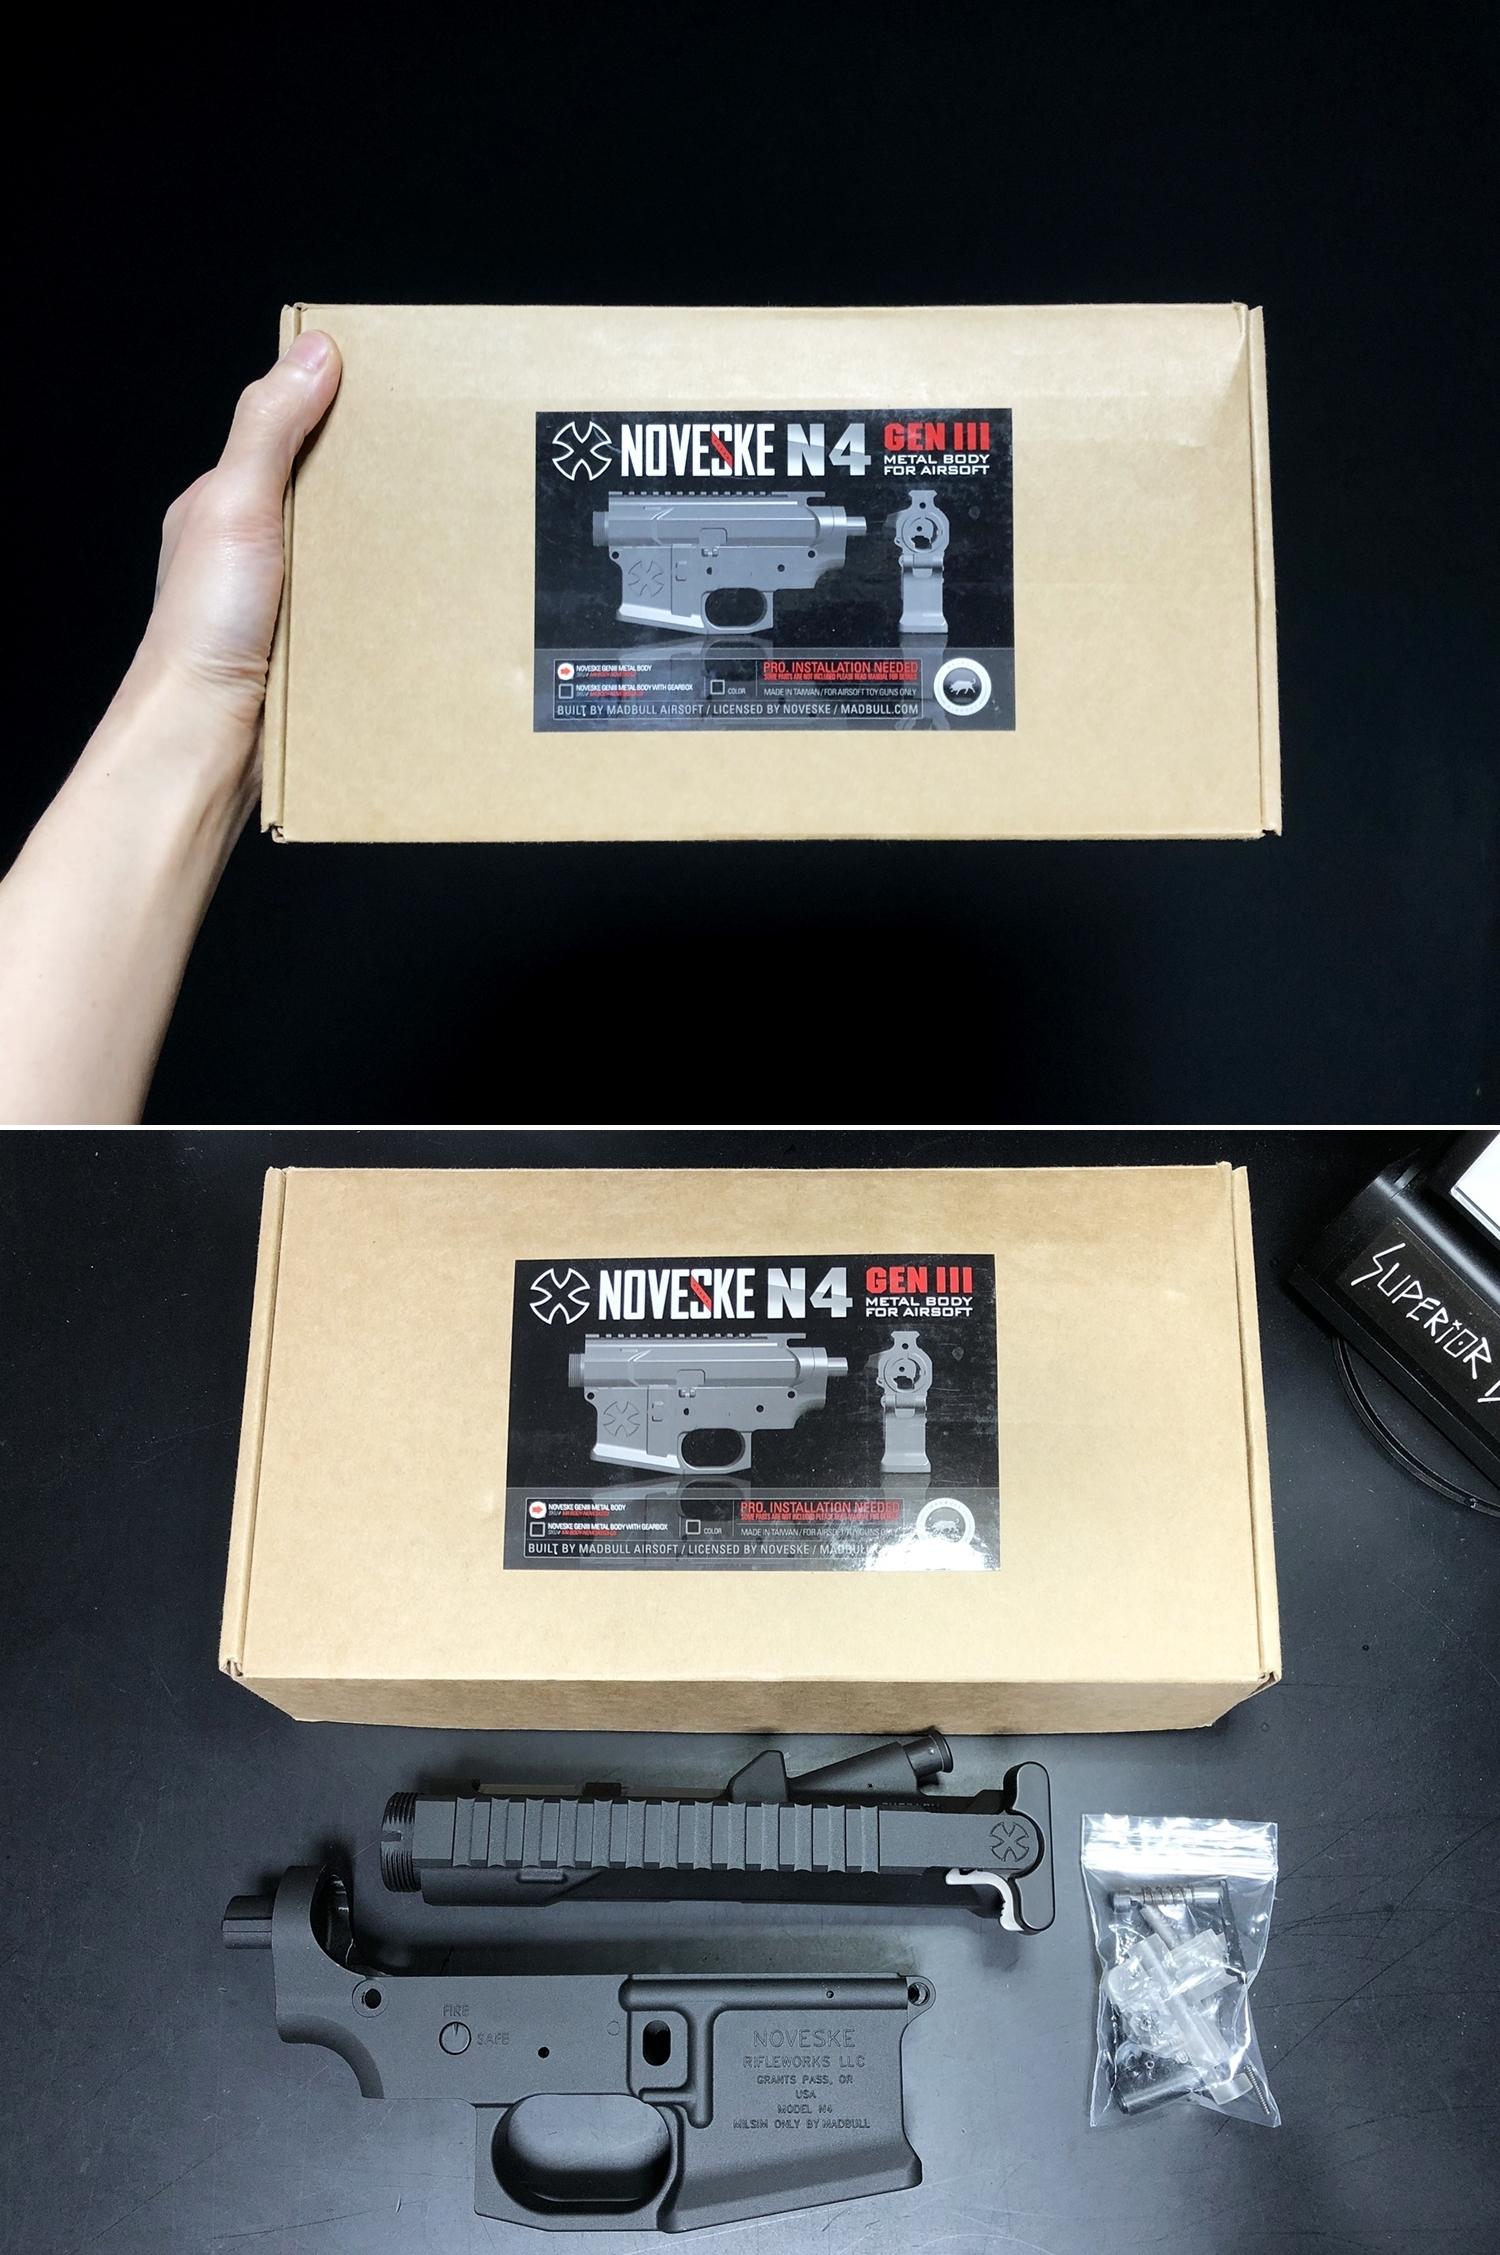 1 NOVESKE GEN3 N4 BY MADBULL!! 『第一弾』 新たにSTD民間系ARを作り始めたいと思います!! STD AR-15 M4 スタンダード 電動ガン マルイ ノベスケ ノベスキー マットブル メタルフレーム 動作テスト 組込 取付 カス